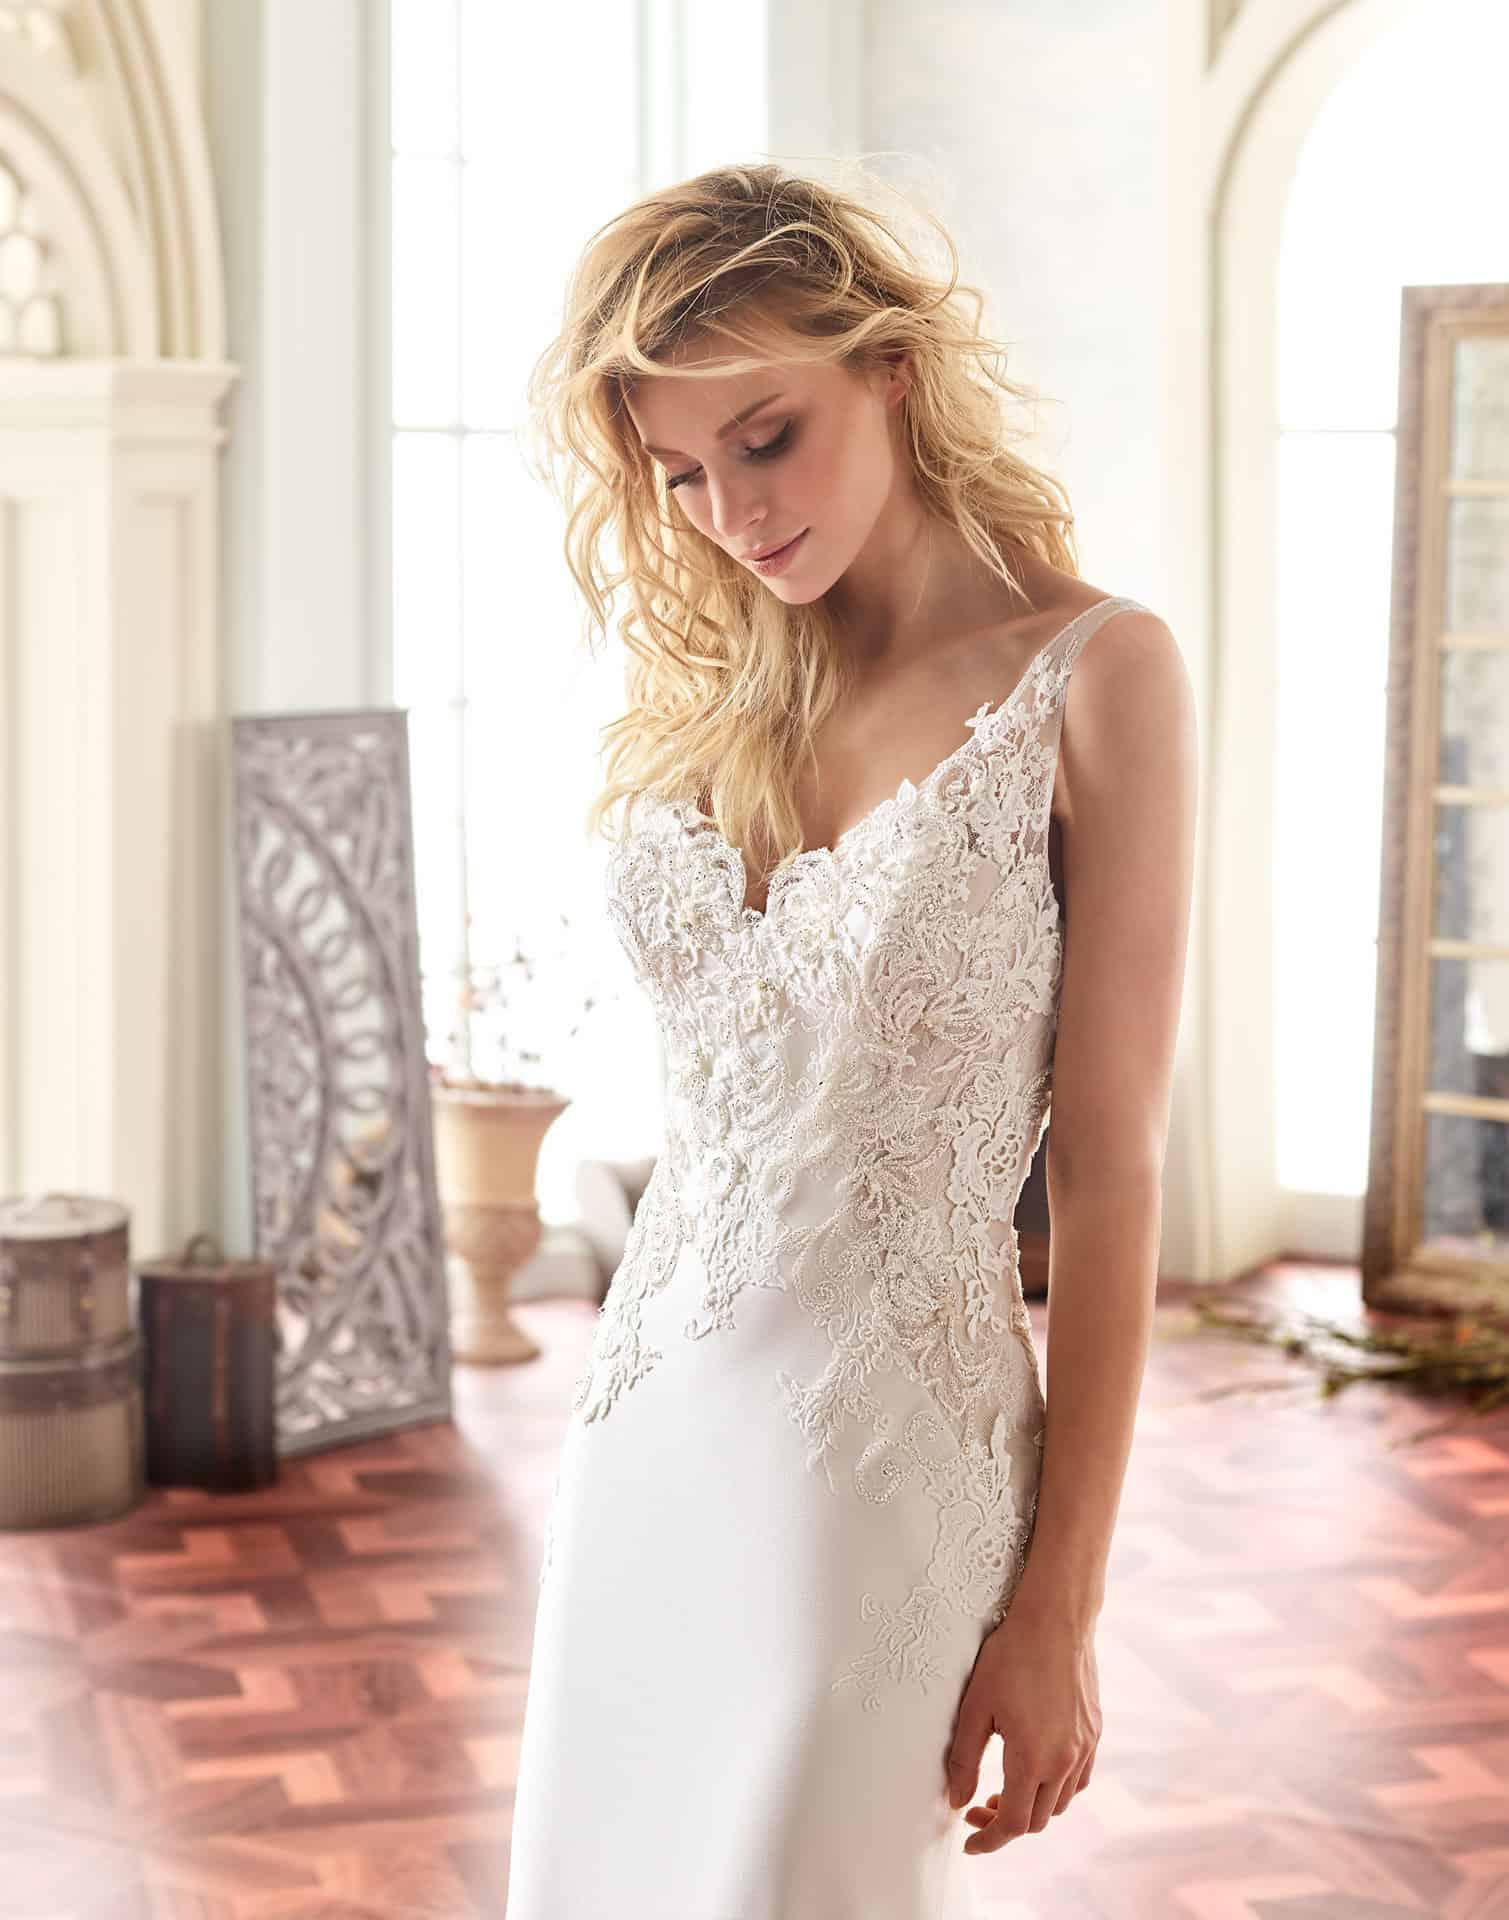 Wedding Dresses Gallery 30